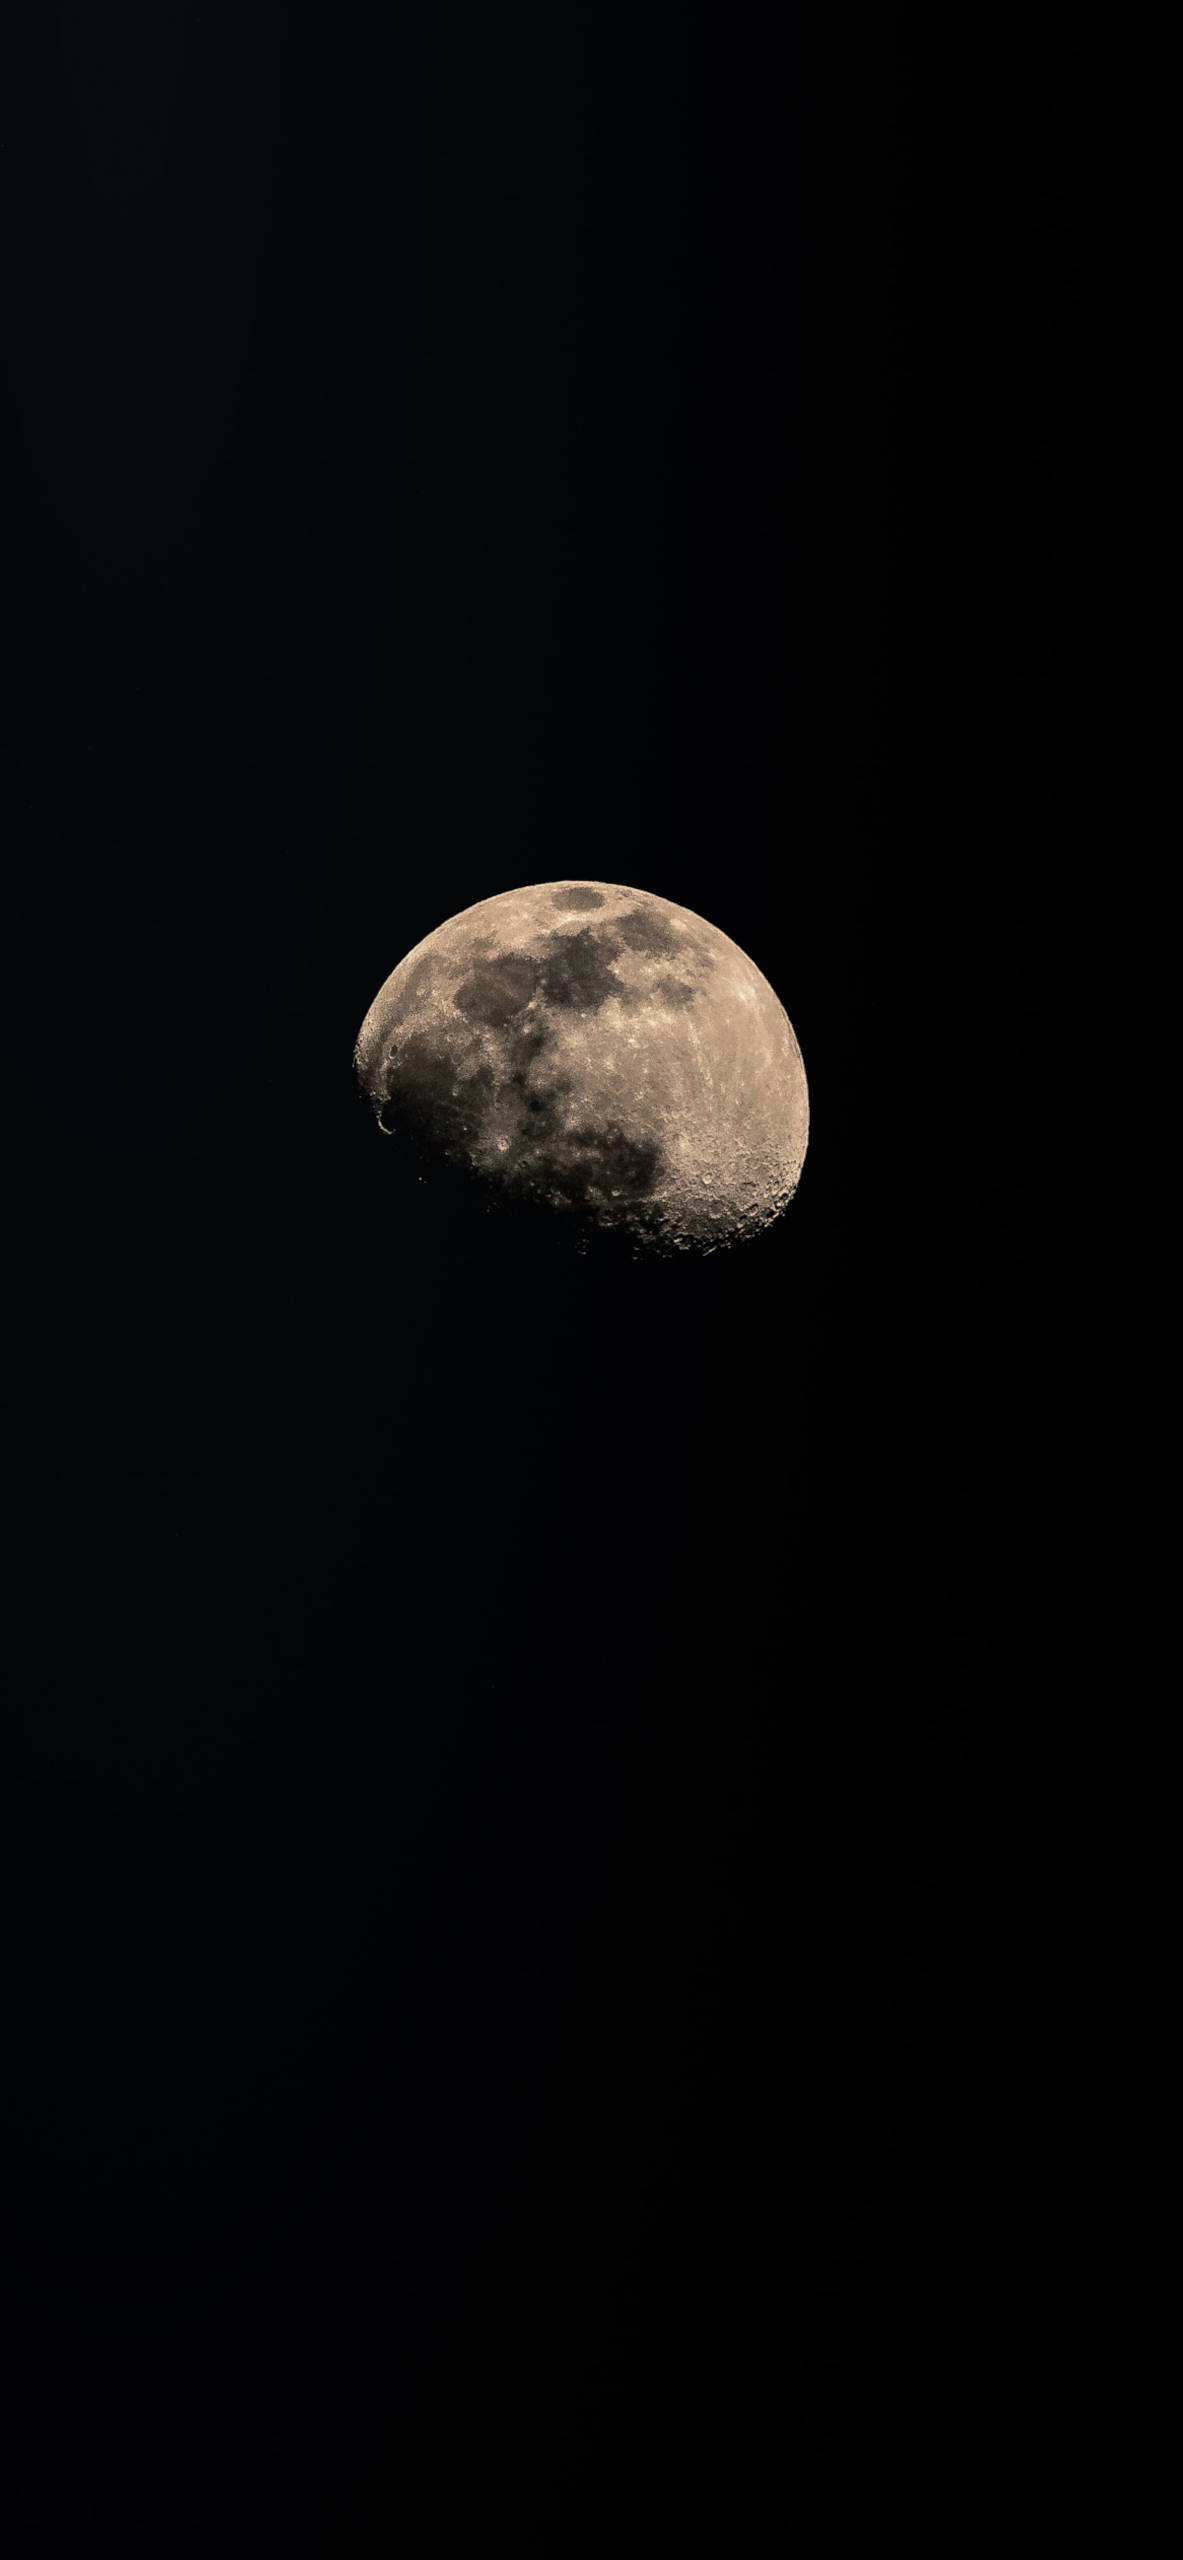 iPhone wallpapers moon full black Moon